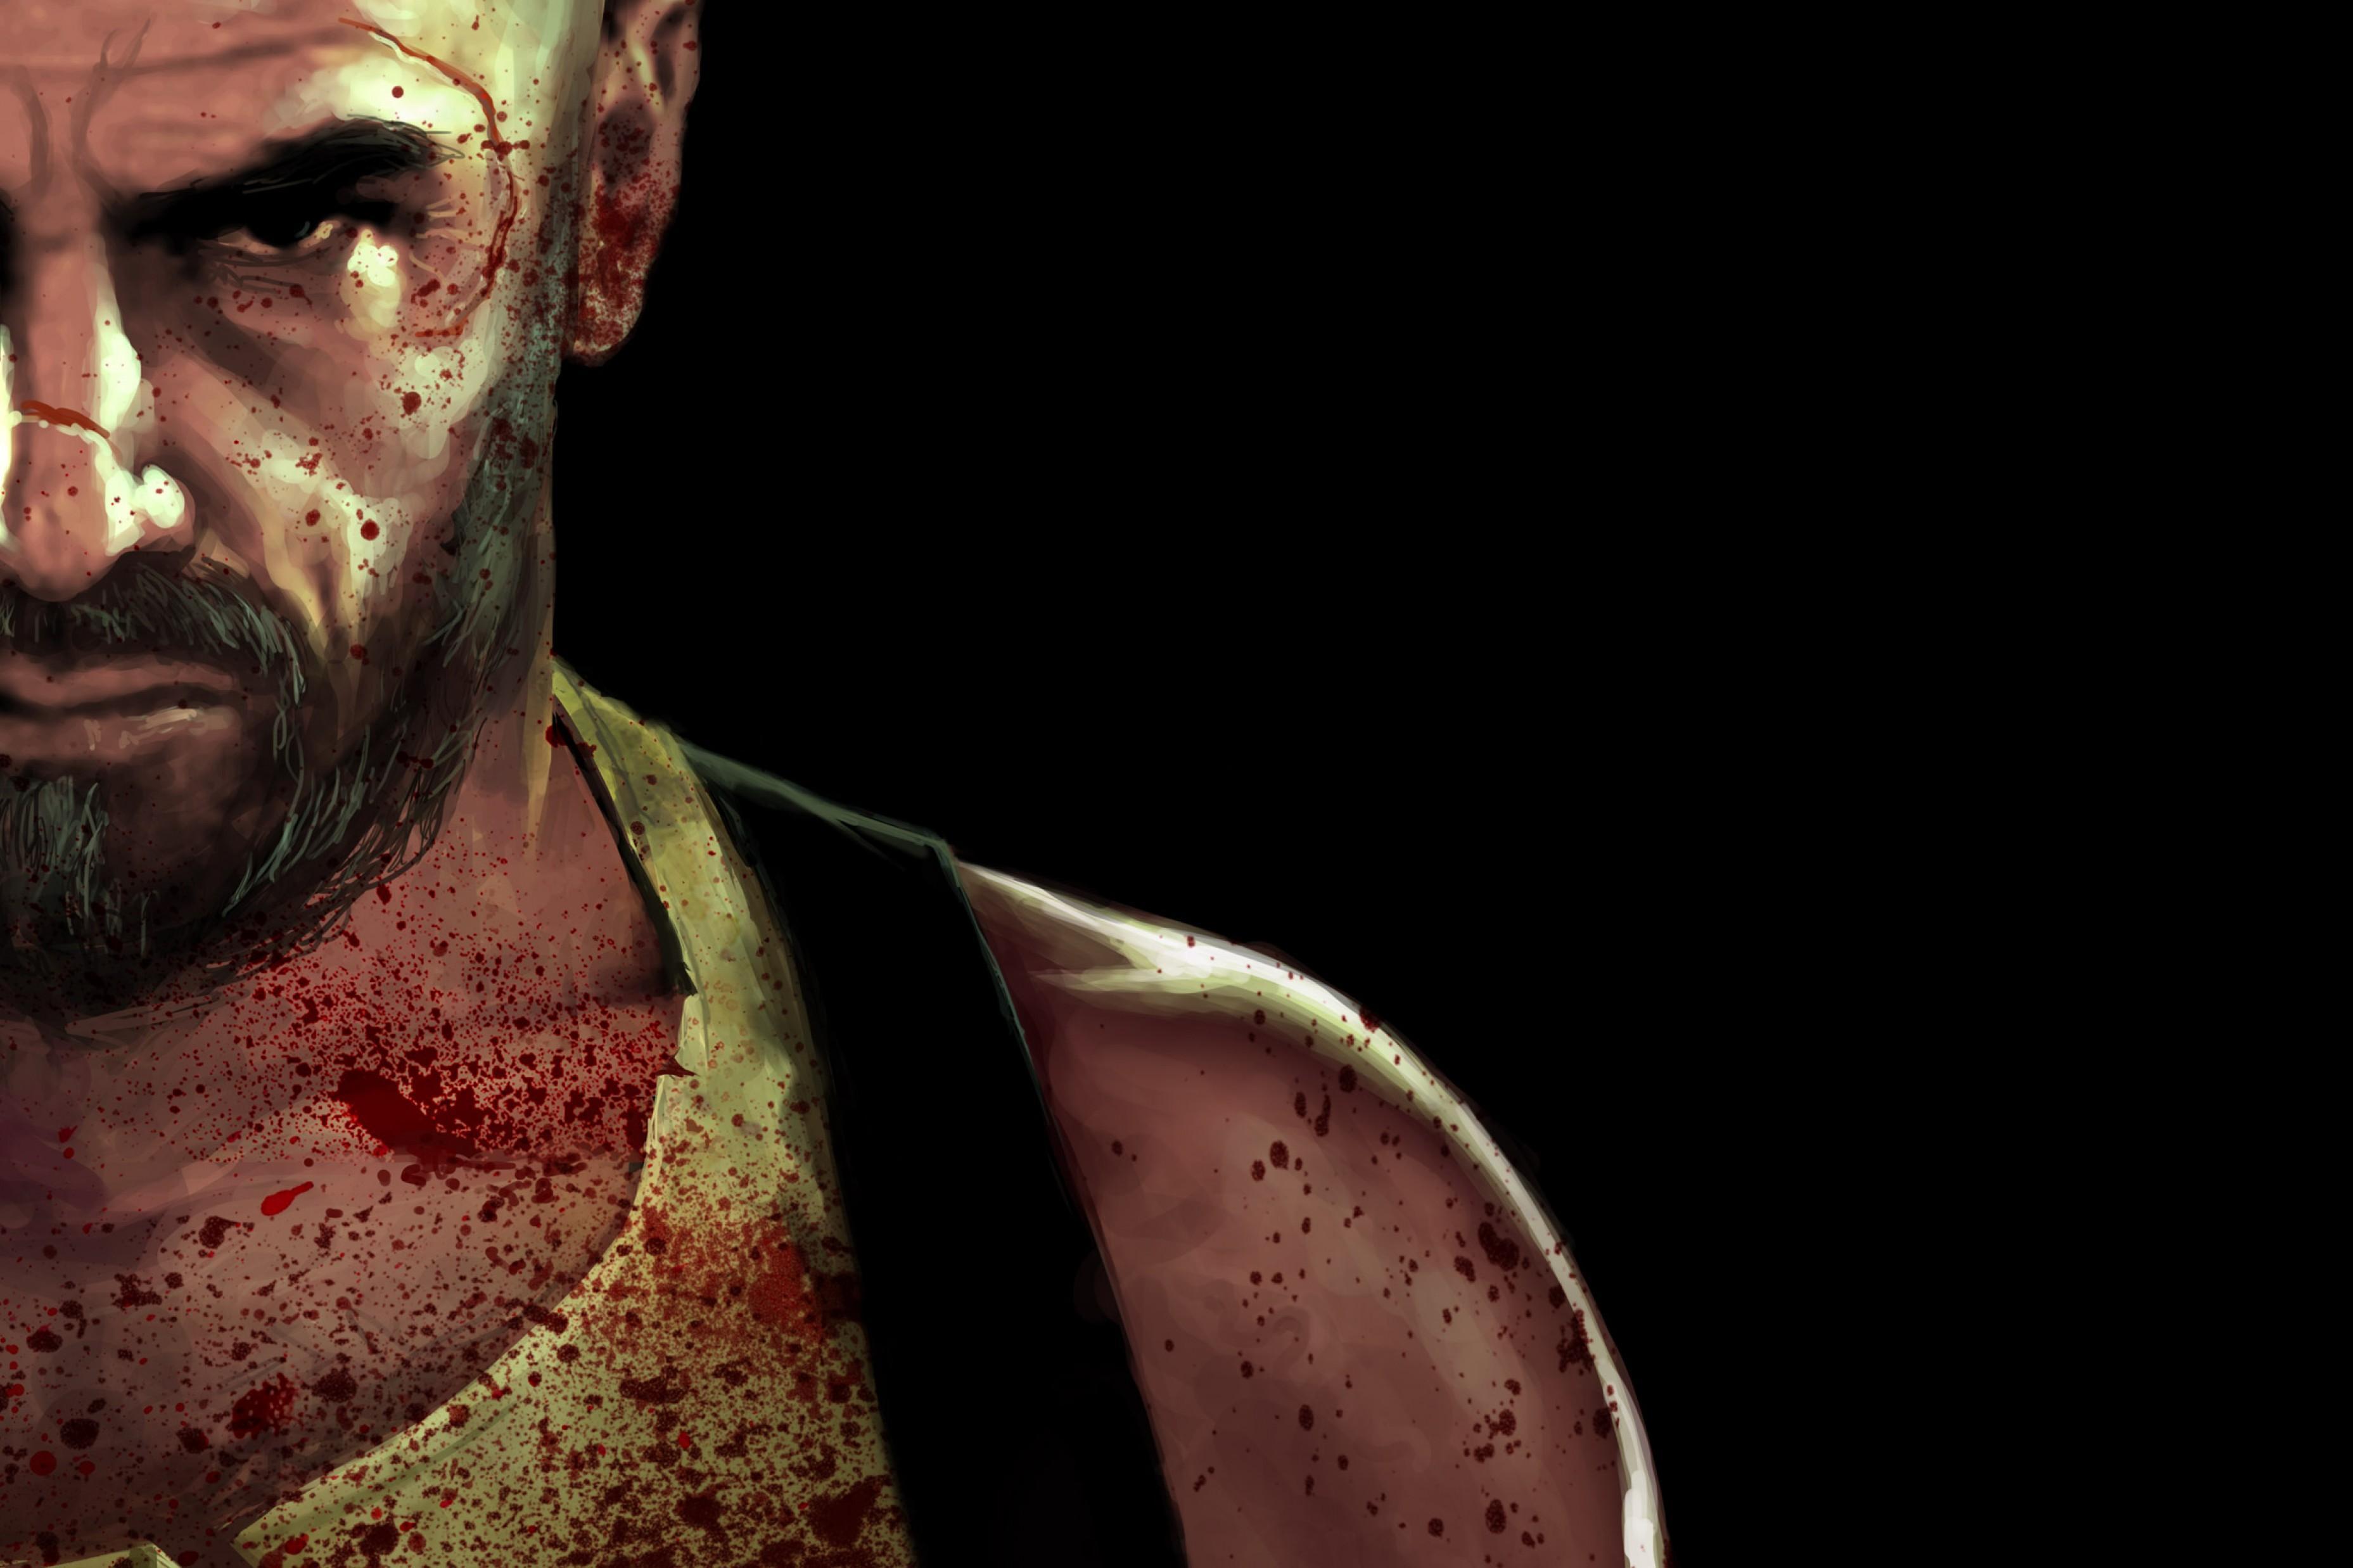 Max Payne 3 Computer Wallpapers Desktop Backgrounds 3714x2475